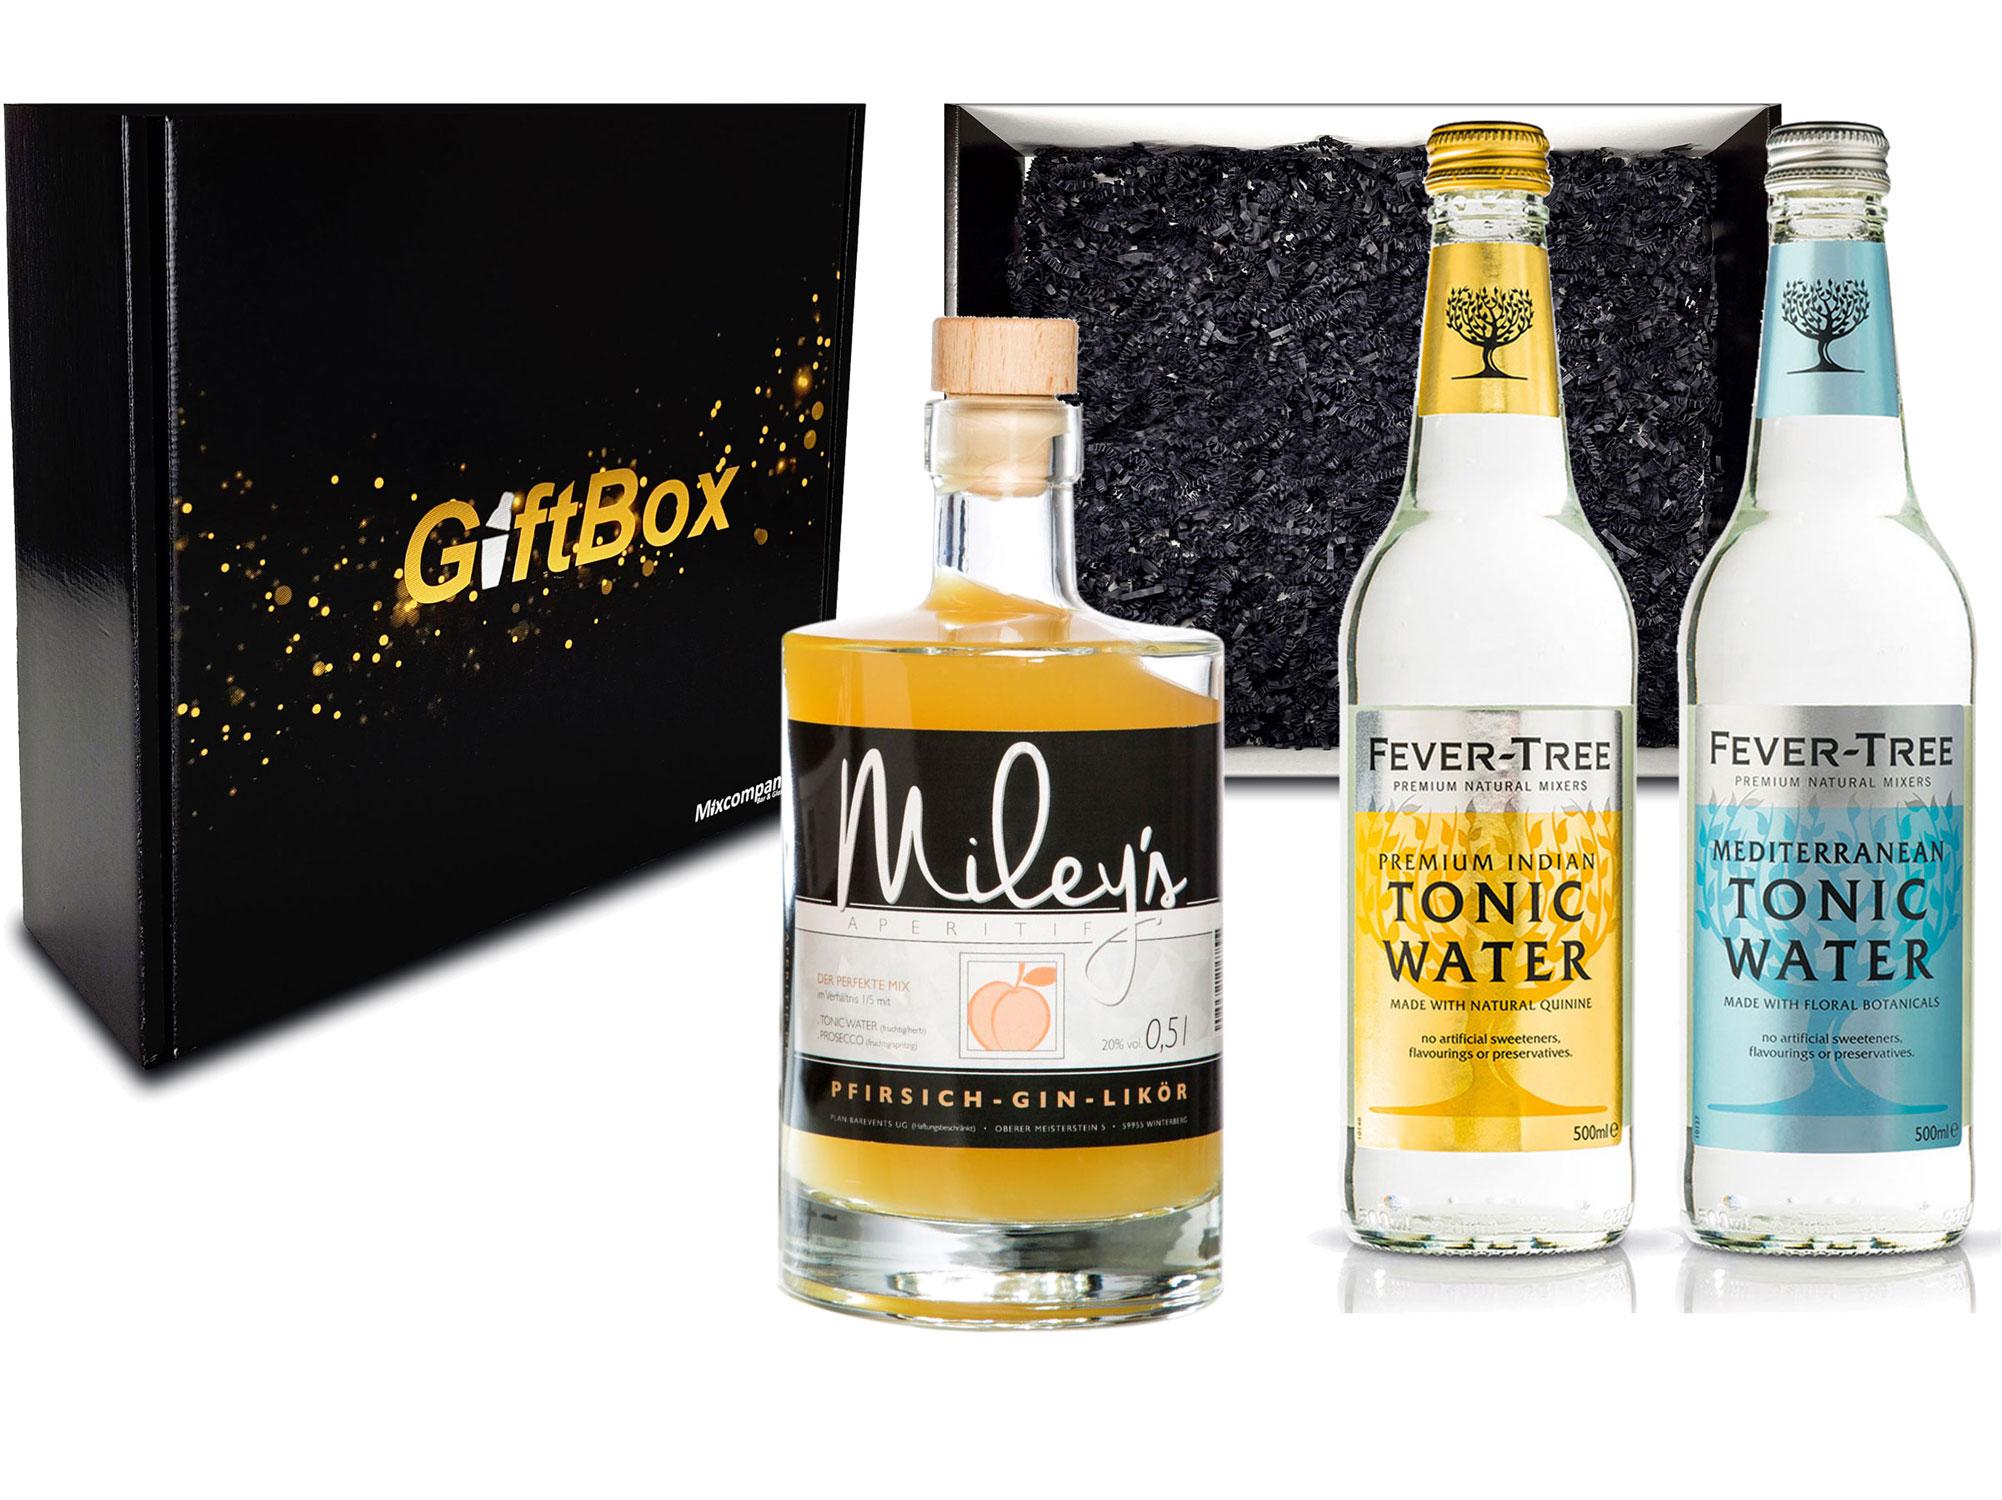 Gin Tonic Giftbox Geschenkset - Mileys Pfirsich Gin Likör 0,5l (20% Vol) + 2x Fever Tree Tonic Water Mix je 200ml inkl. Pfand MEHRWEG - [Enthält Sulfite]